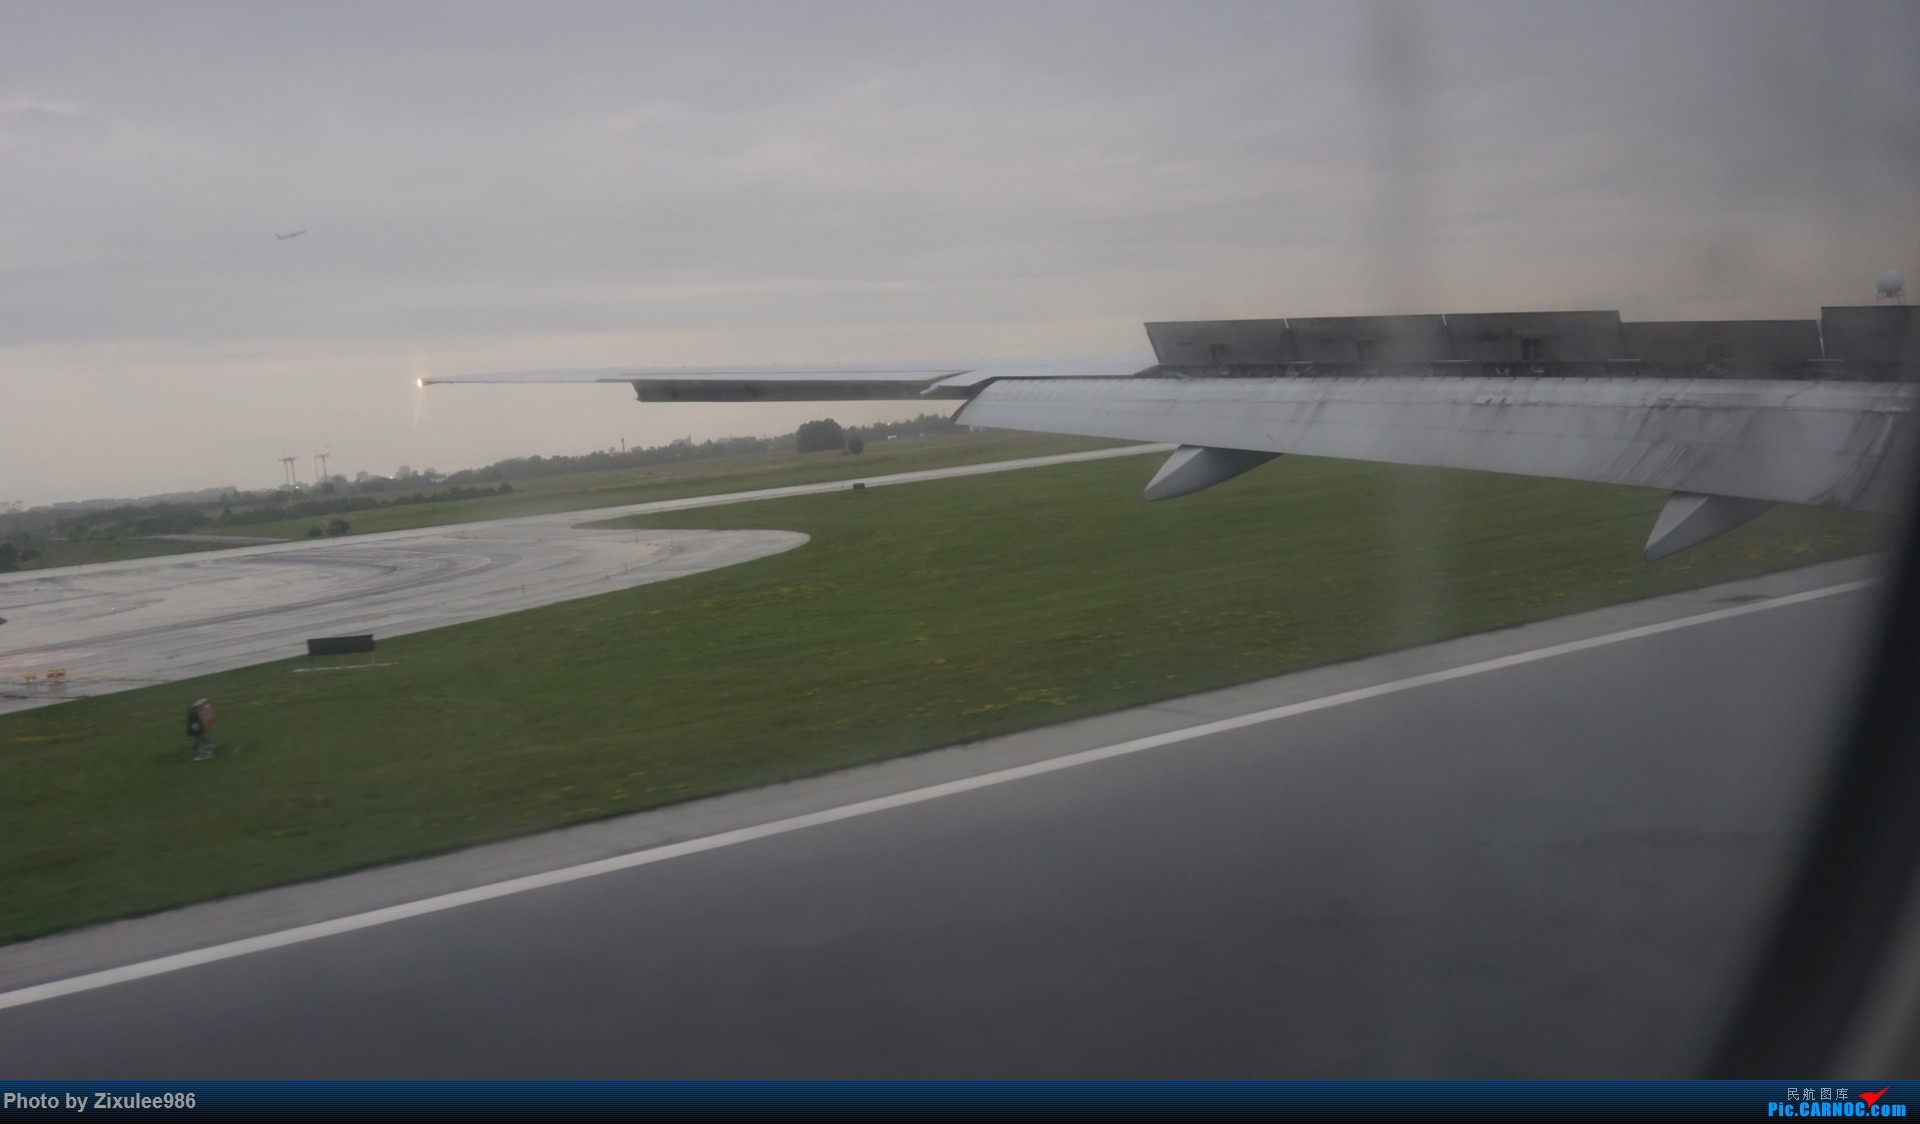 Re:[原创]加拿大21日游学之旅 (二)~加航AC28..PVG-YYZ到达多村后的雨天~多图缓更(将会附上上一集忘发的flightlog)请各位大侠谅解~ BOEING 777-333 (ER) C-FITL 加拿大多伦多皮尔逊机场